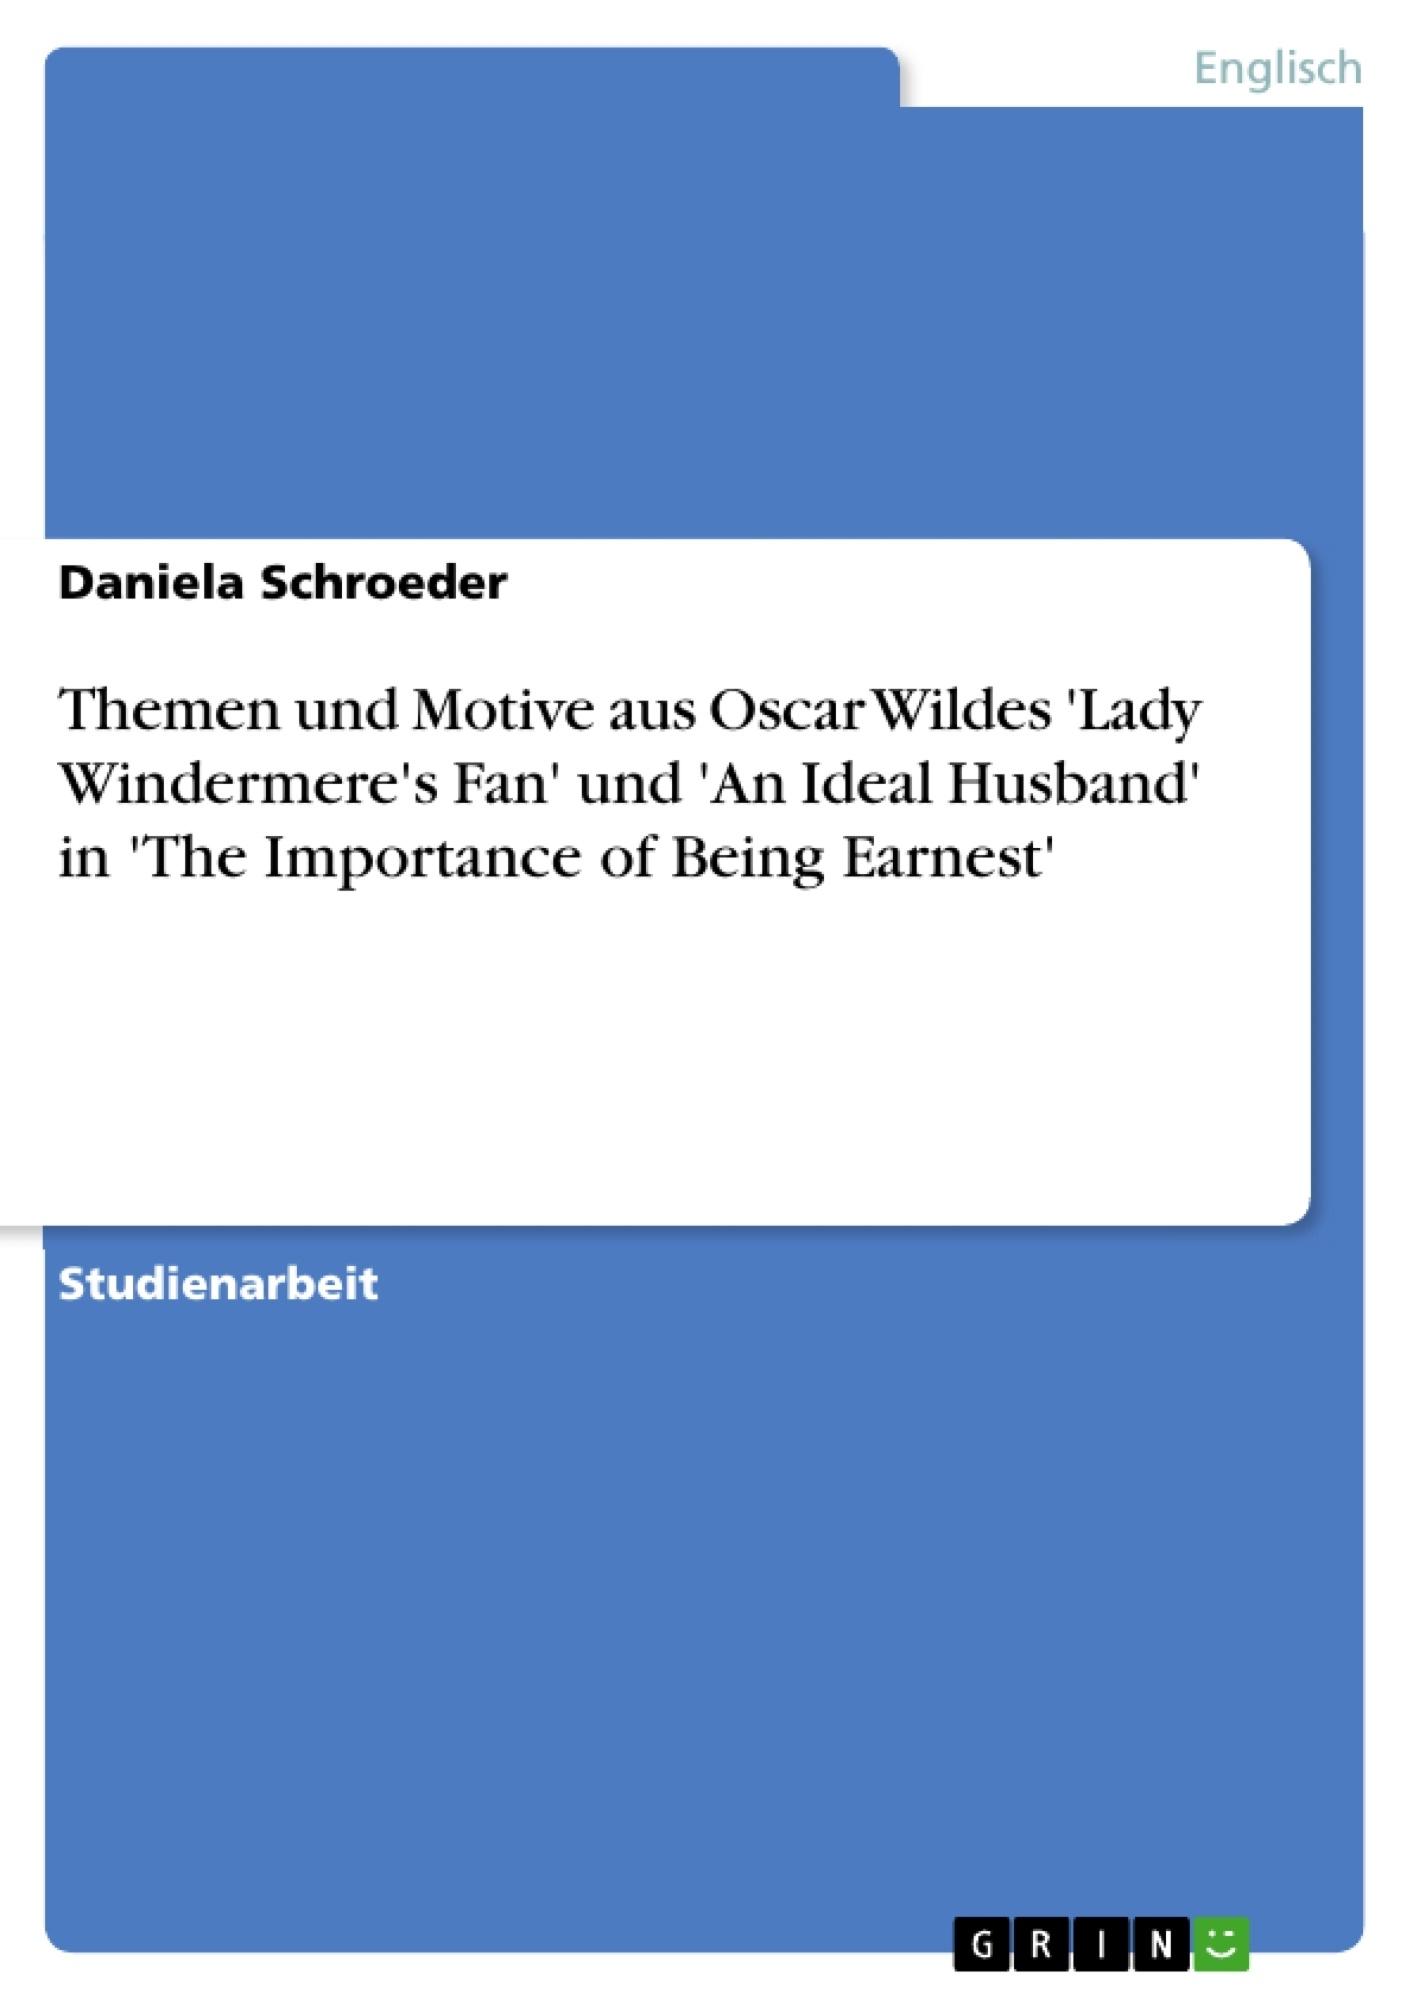 Titel: Themen und Motive aus Oscar Wildes 'Lady Windermere's Fan' und 'An Ideal Husband' in 'The Importance of Being Earnest'